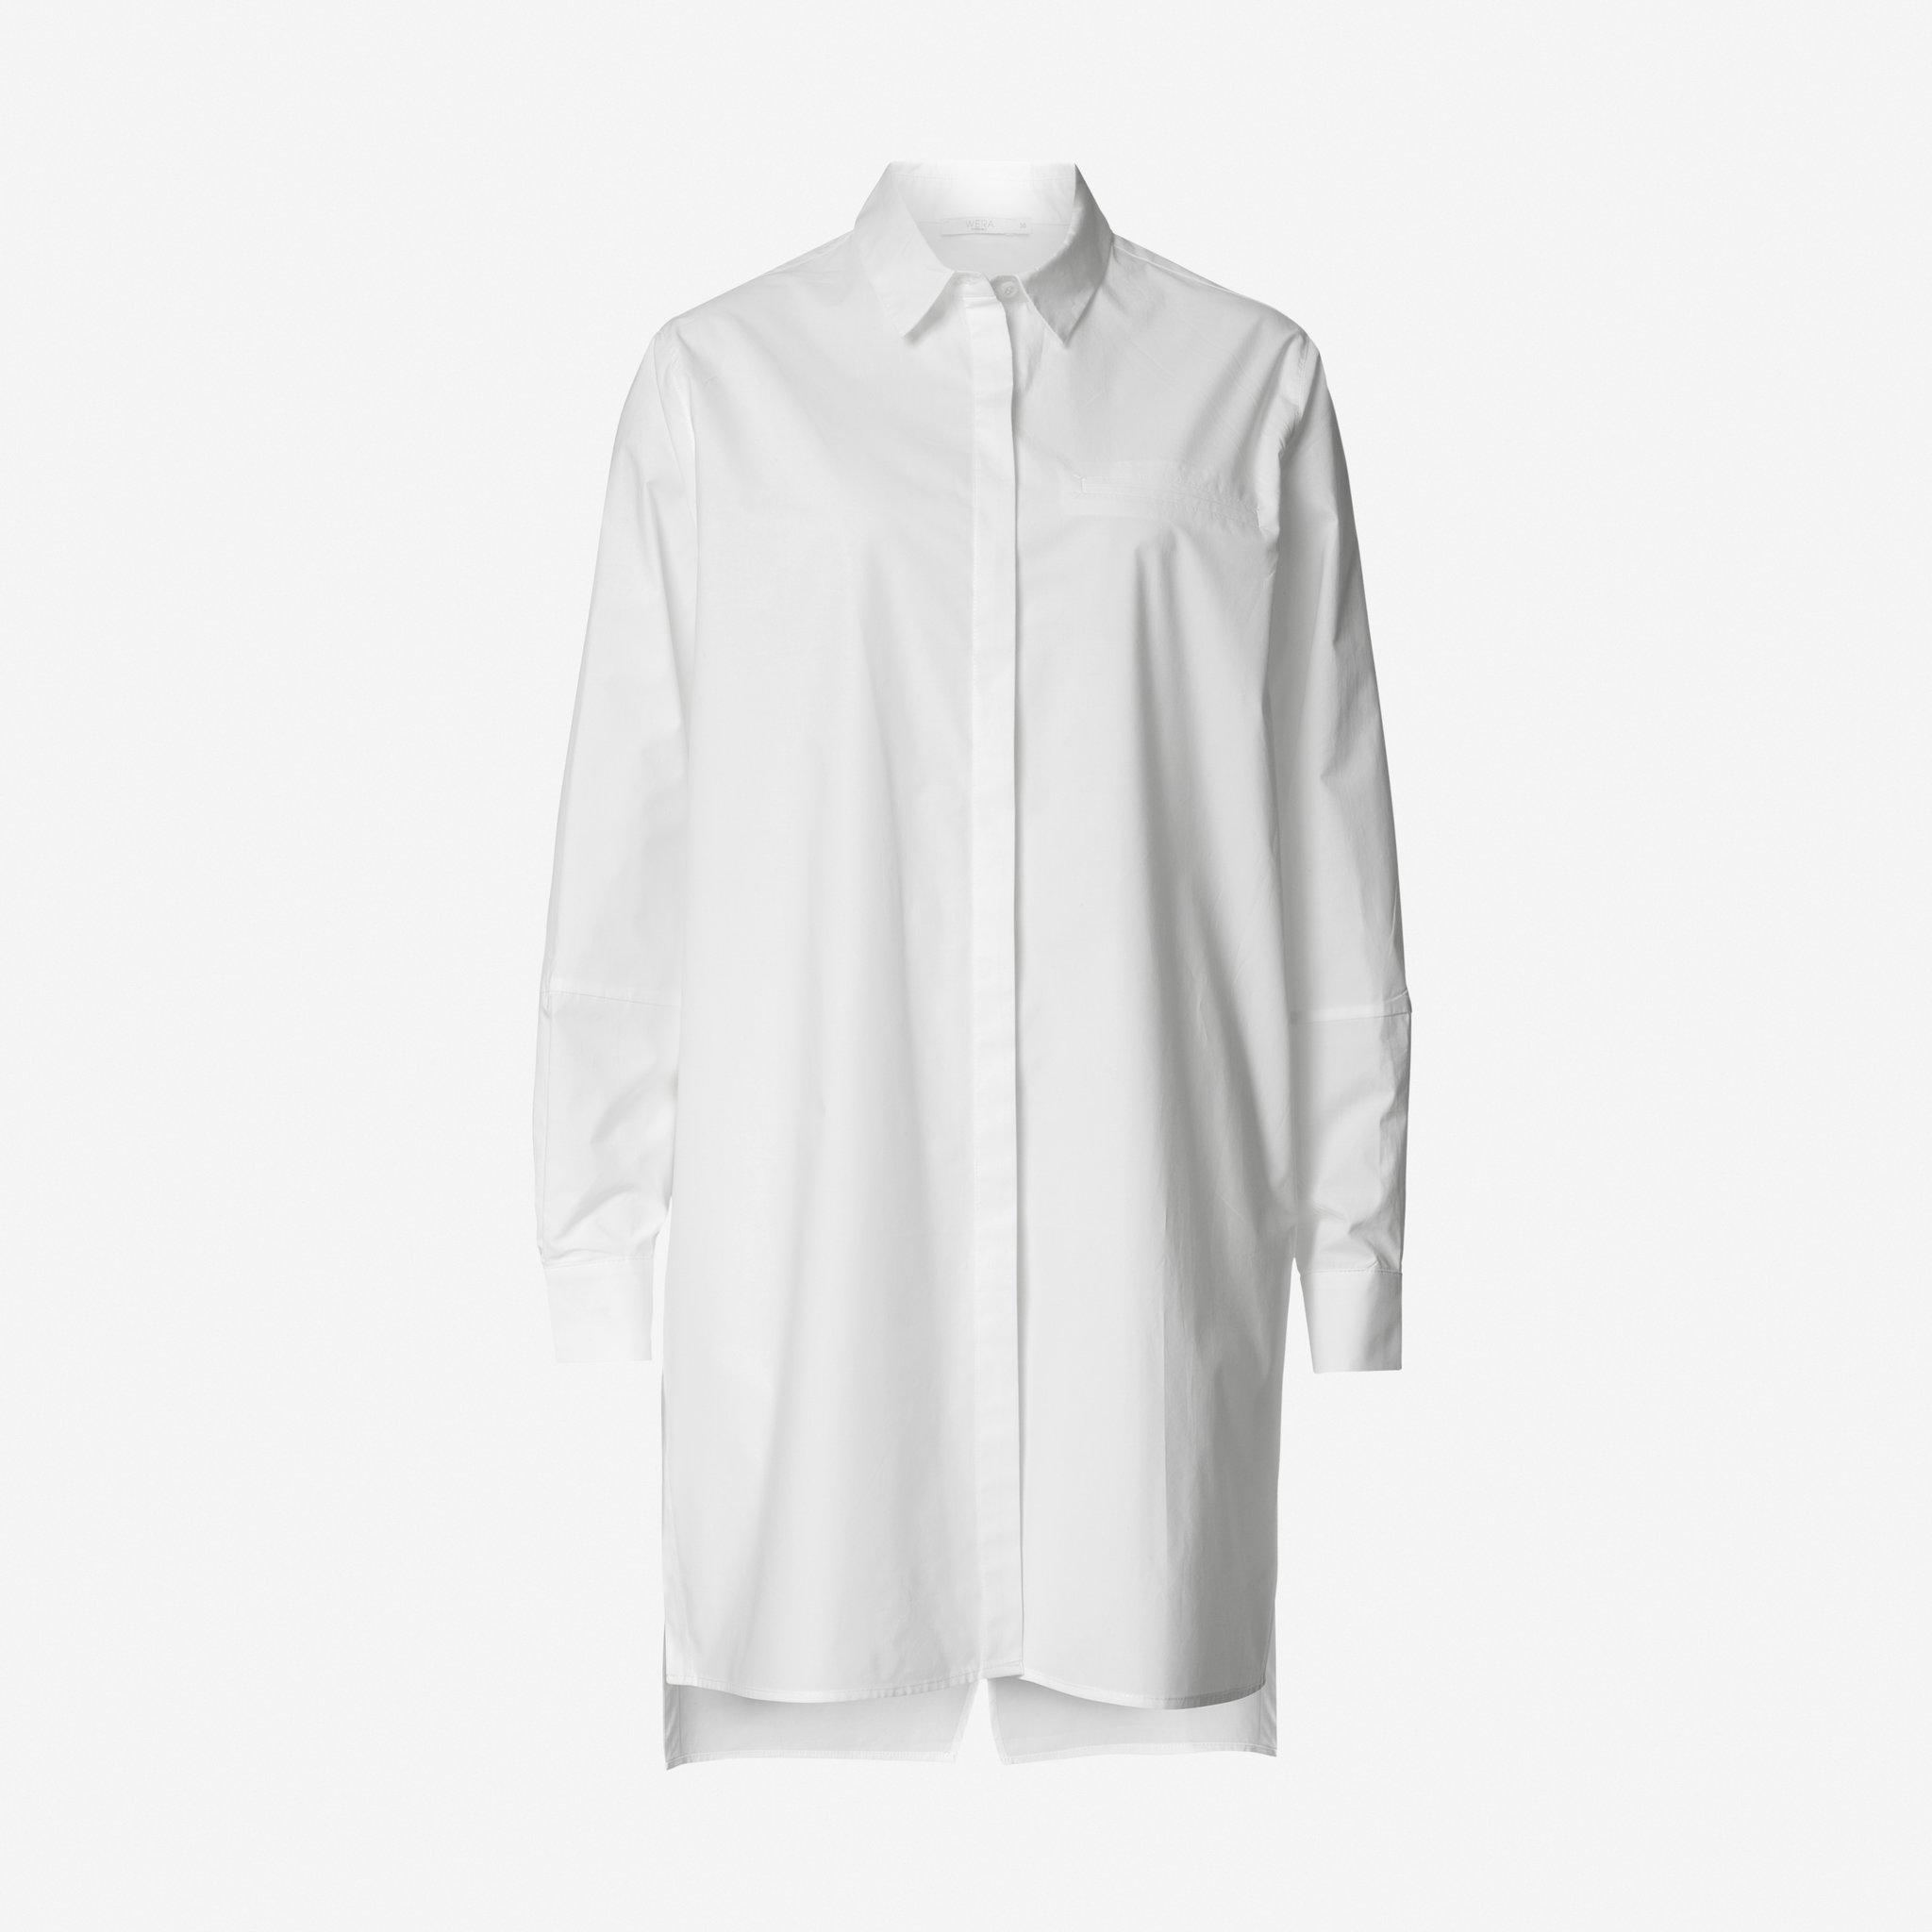 Skjorta i lång modell - Blusar   skjortor - Köp online på åhlens.se! e8bdc8a32220e